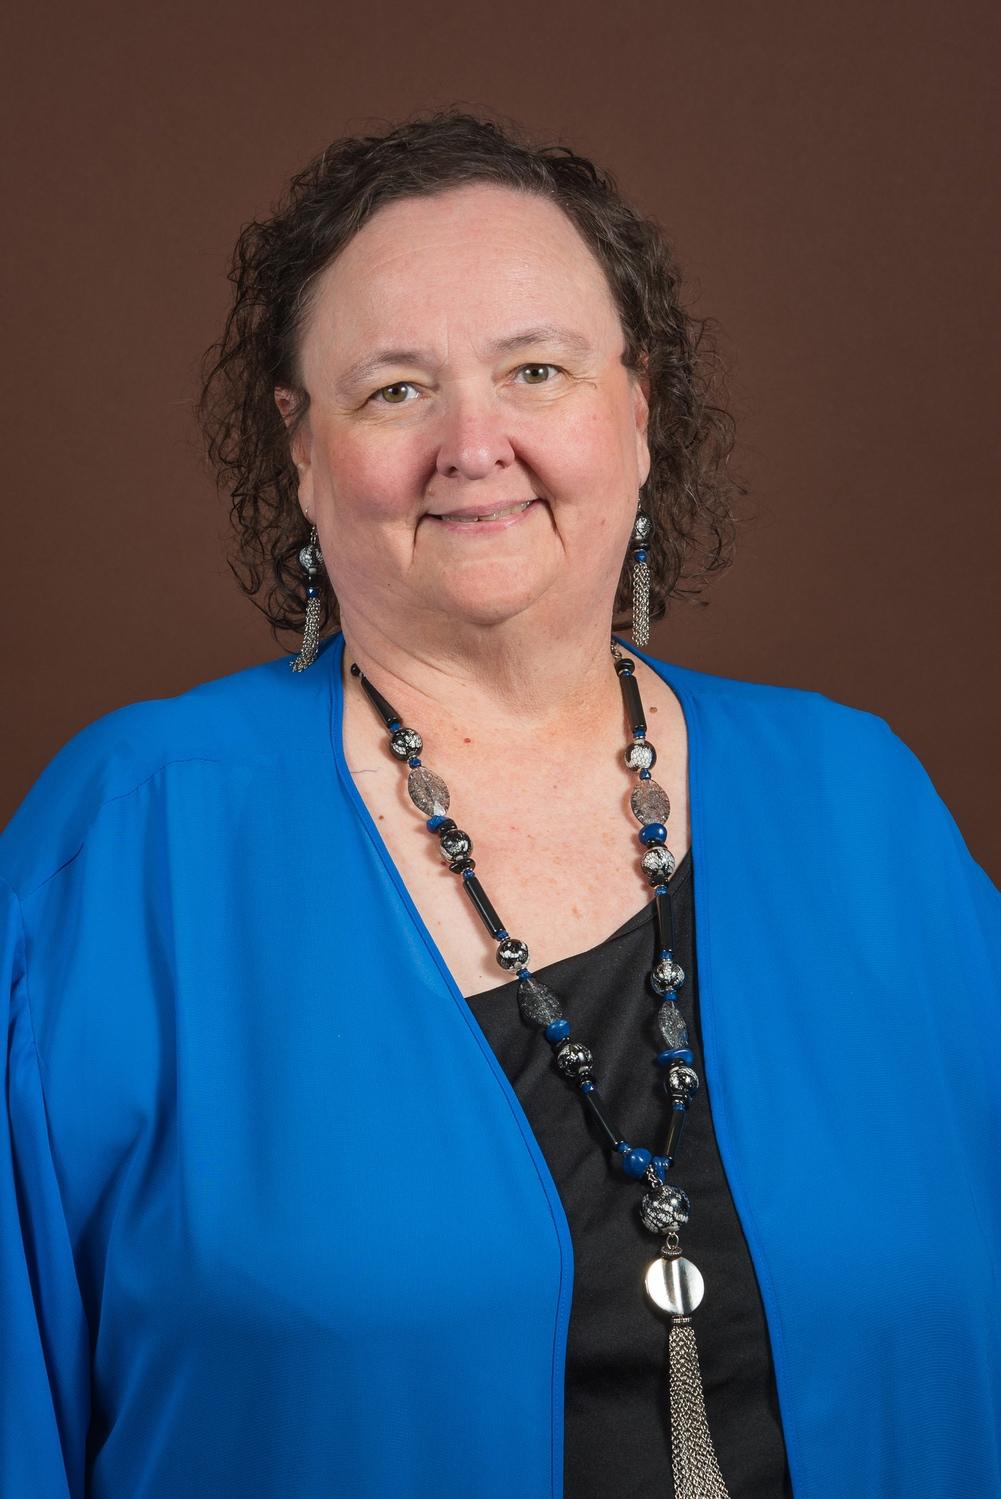 Jenny Griffiths, MSN, ANP-BC